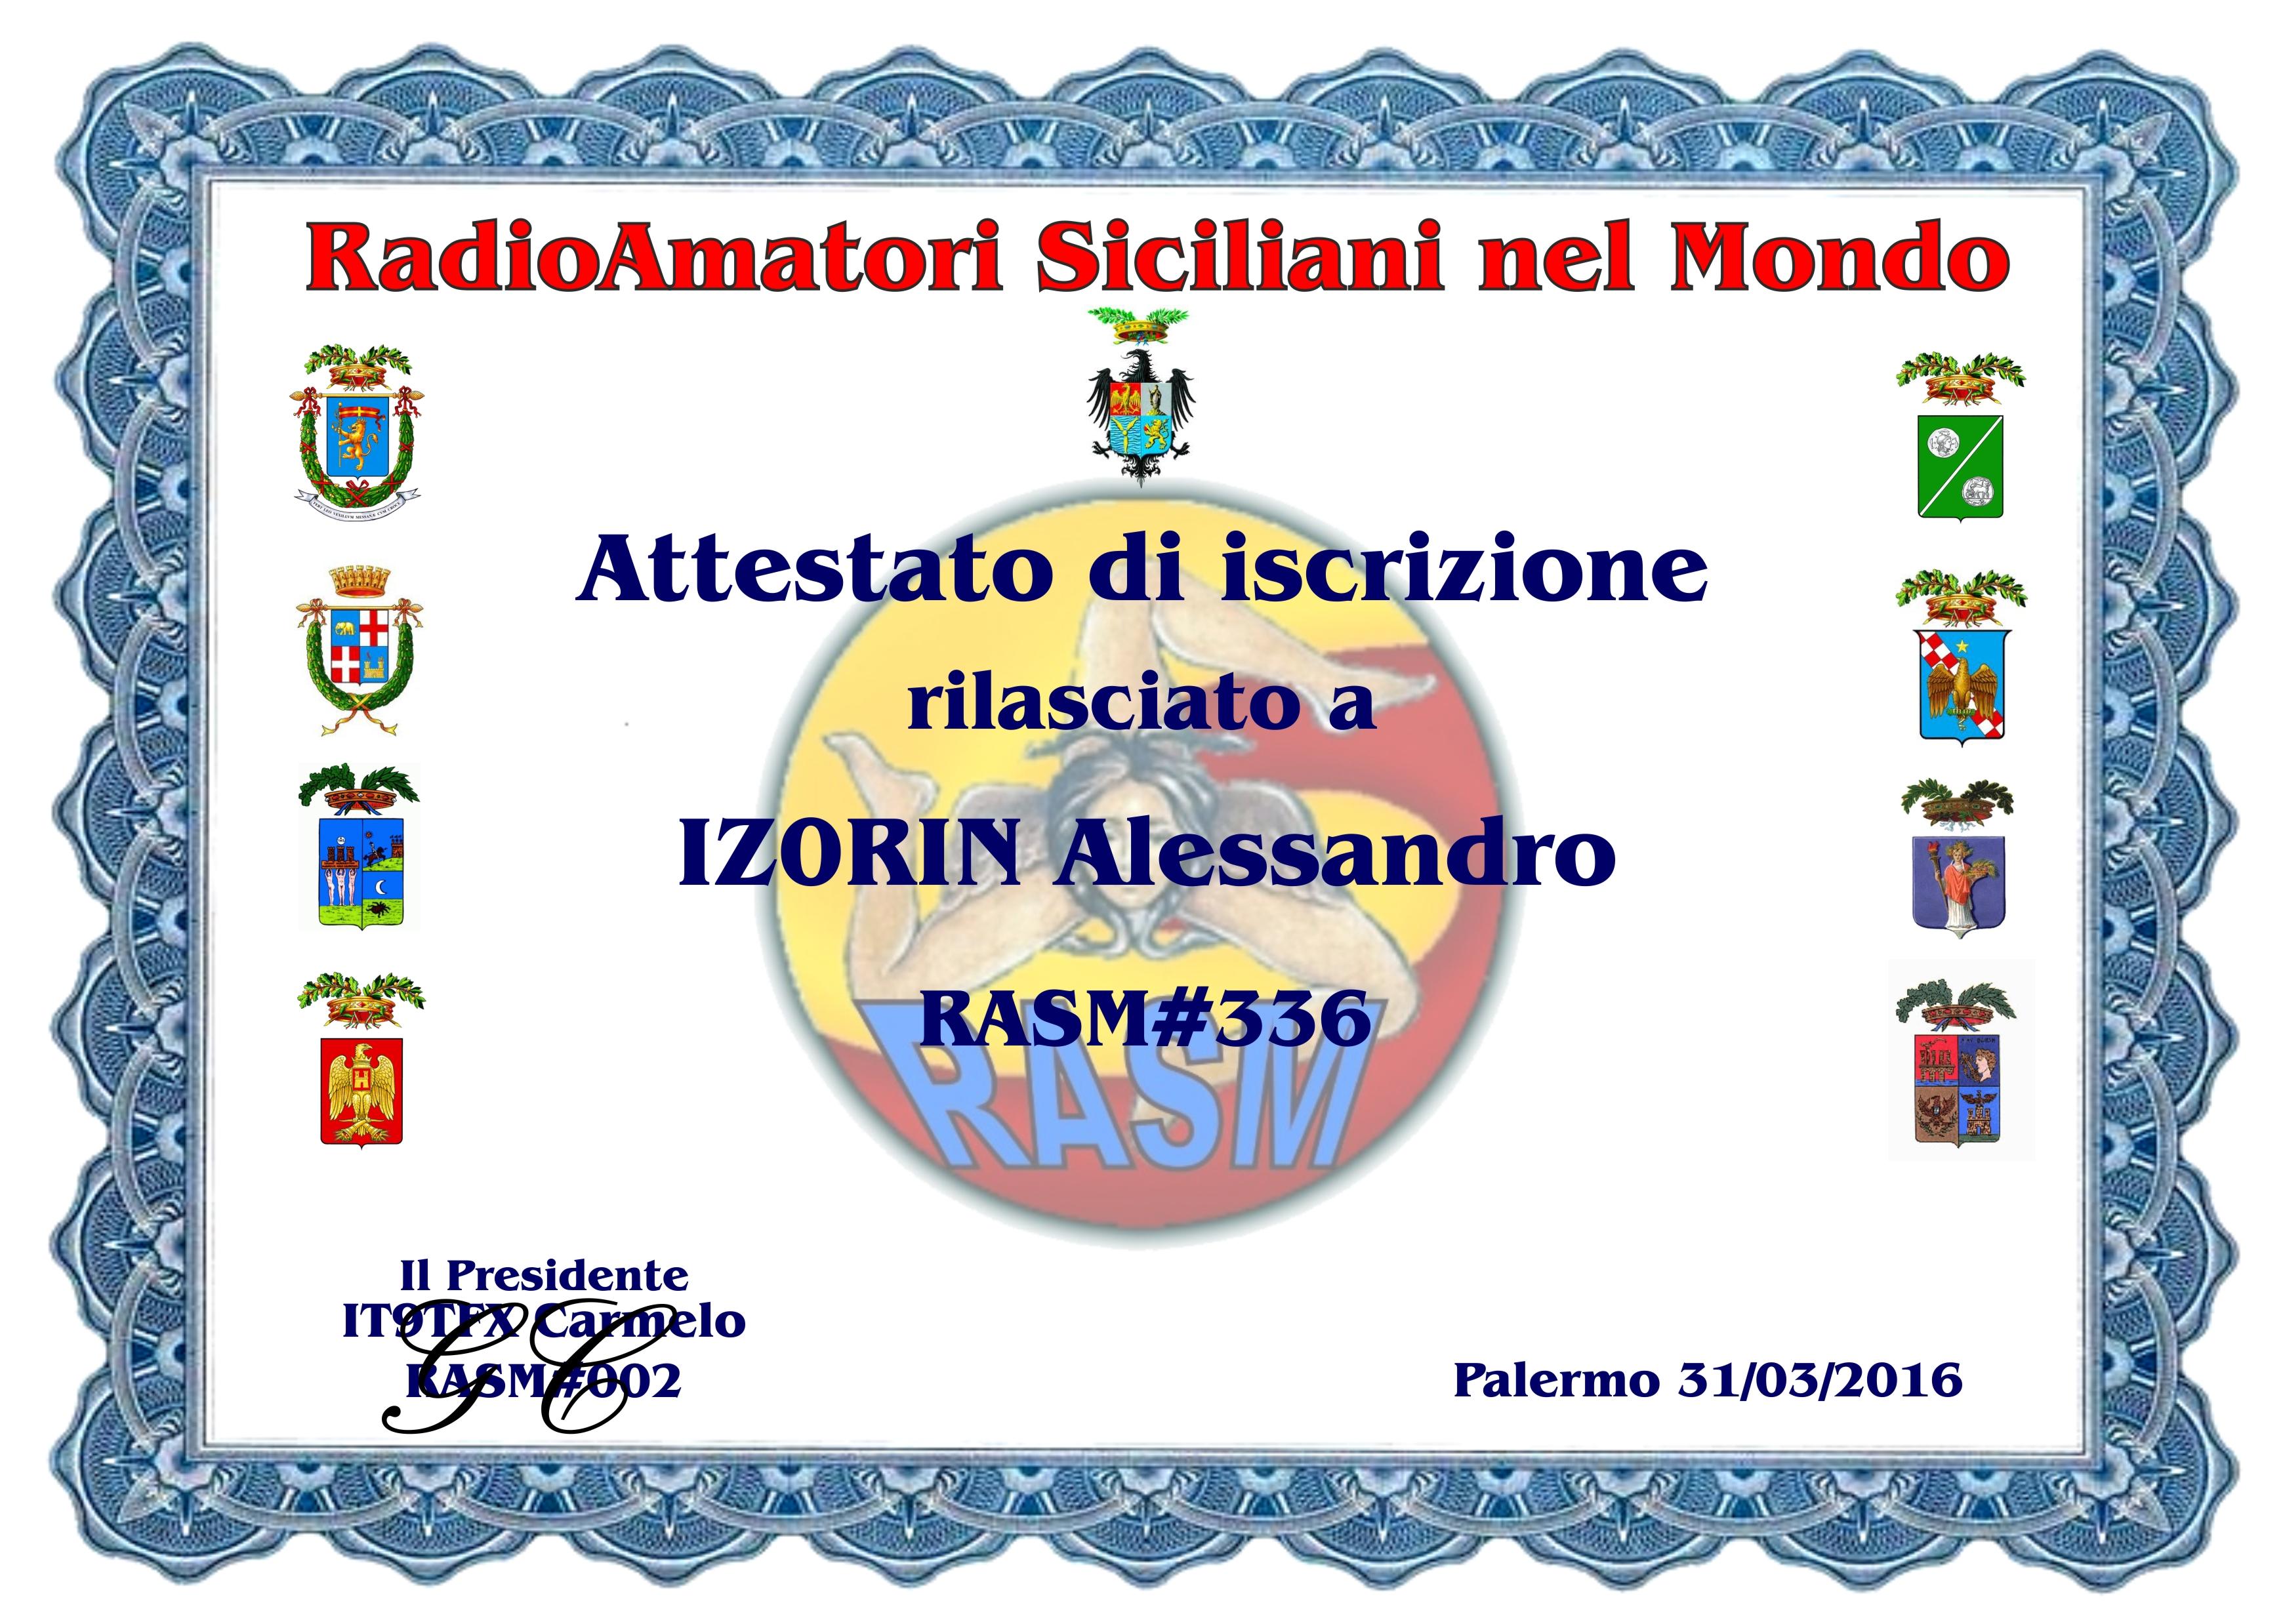 RASM Radioamatori Siciliani nel Mondo